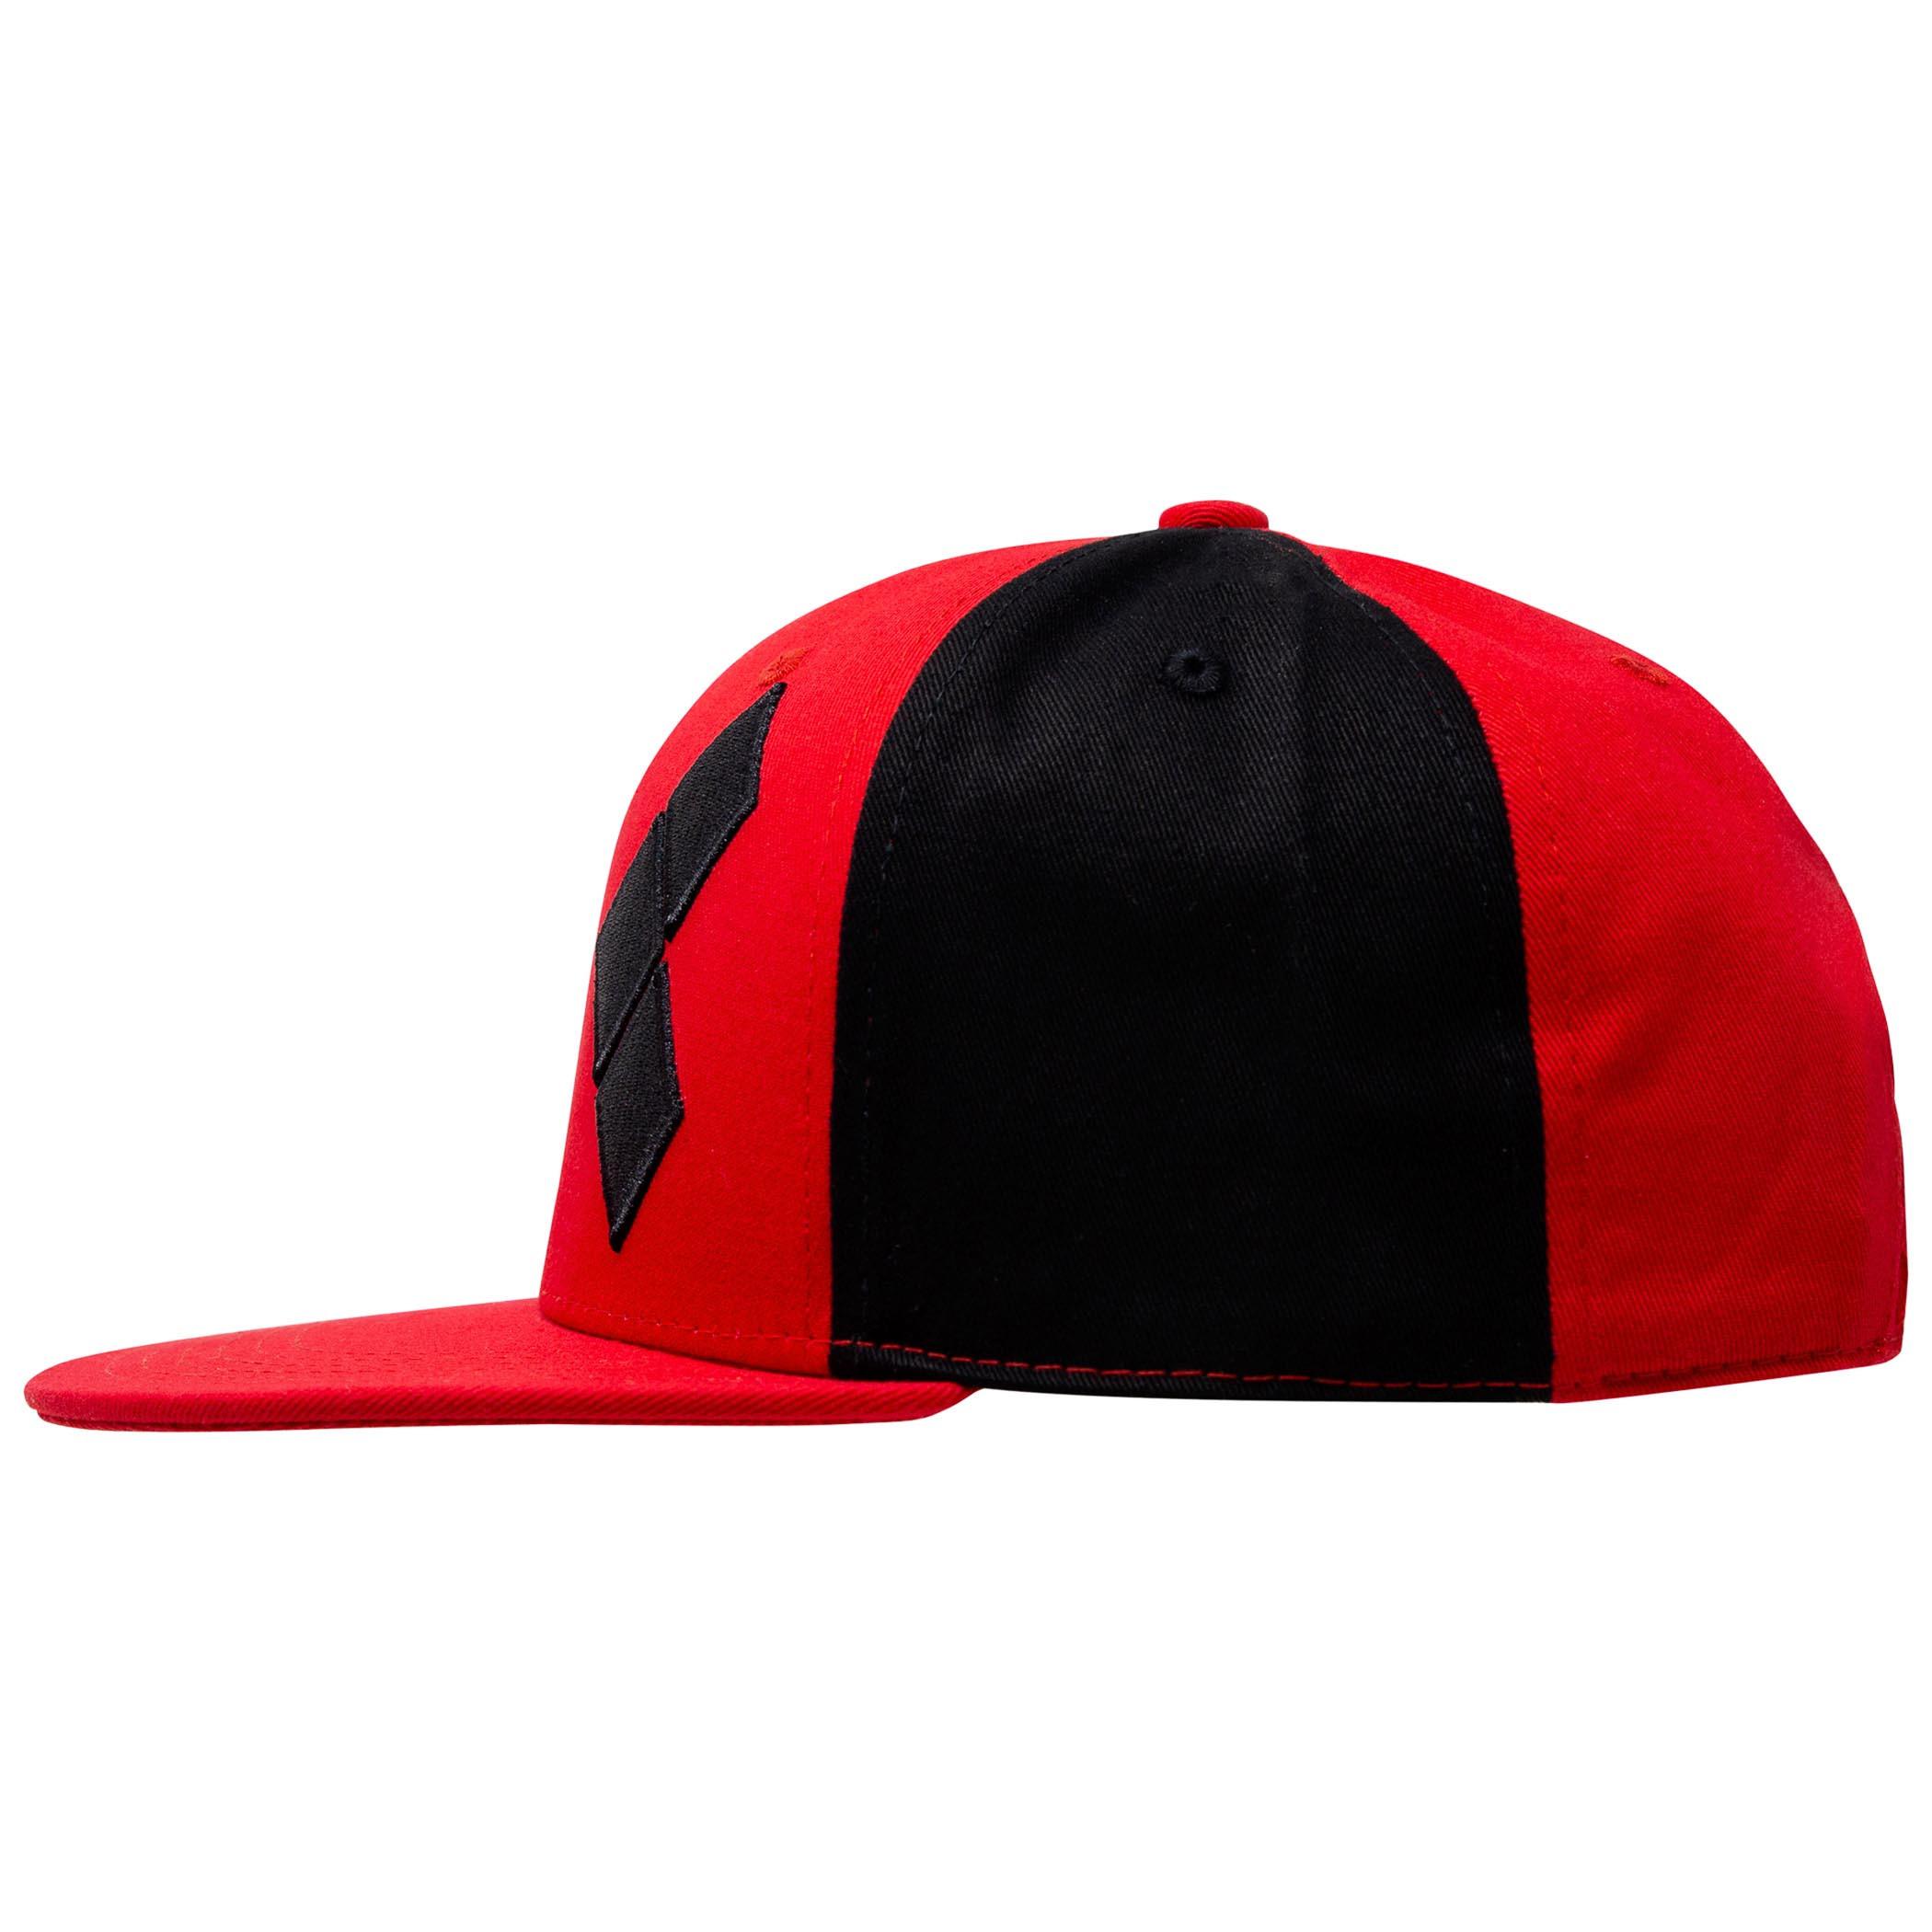 Harley Quinn Diamonds Symbol Adjustable Snapback Hat